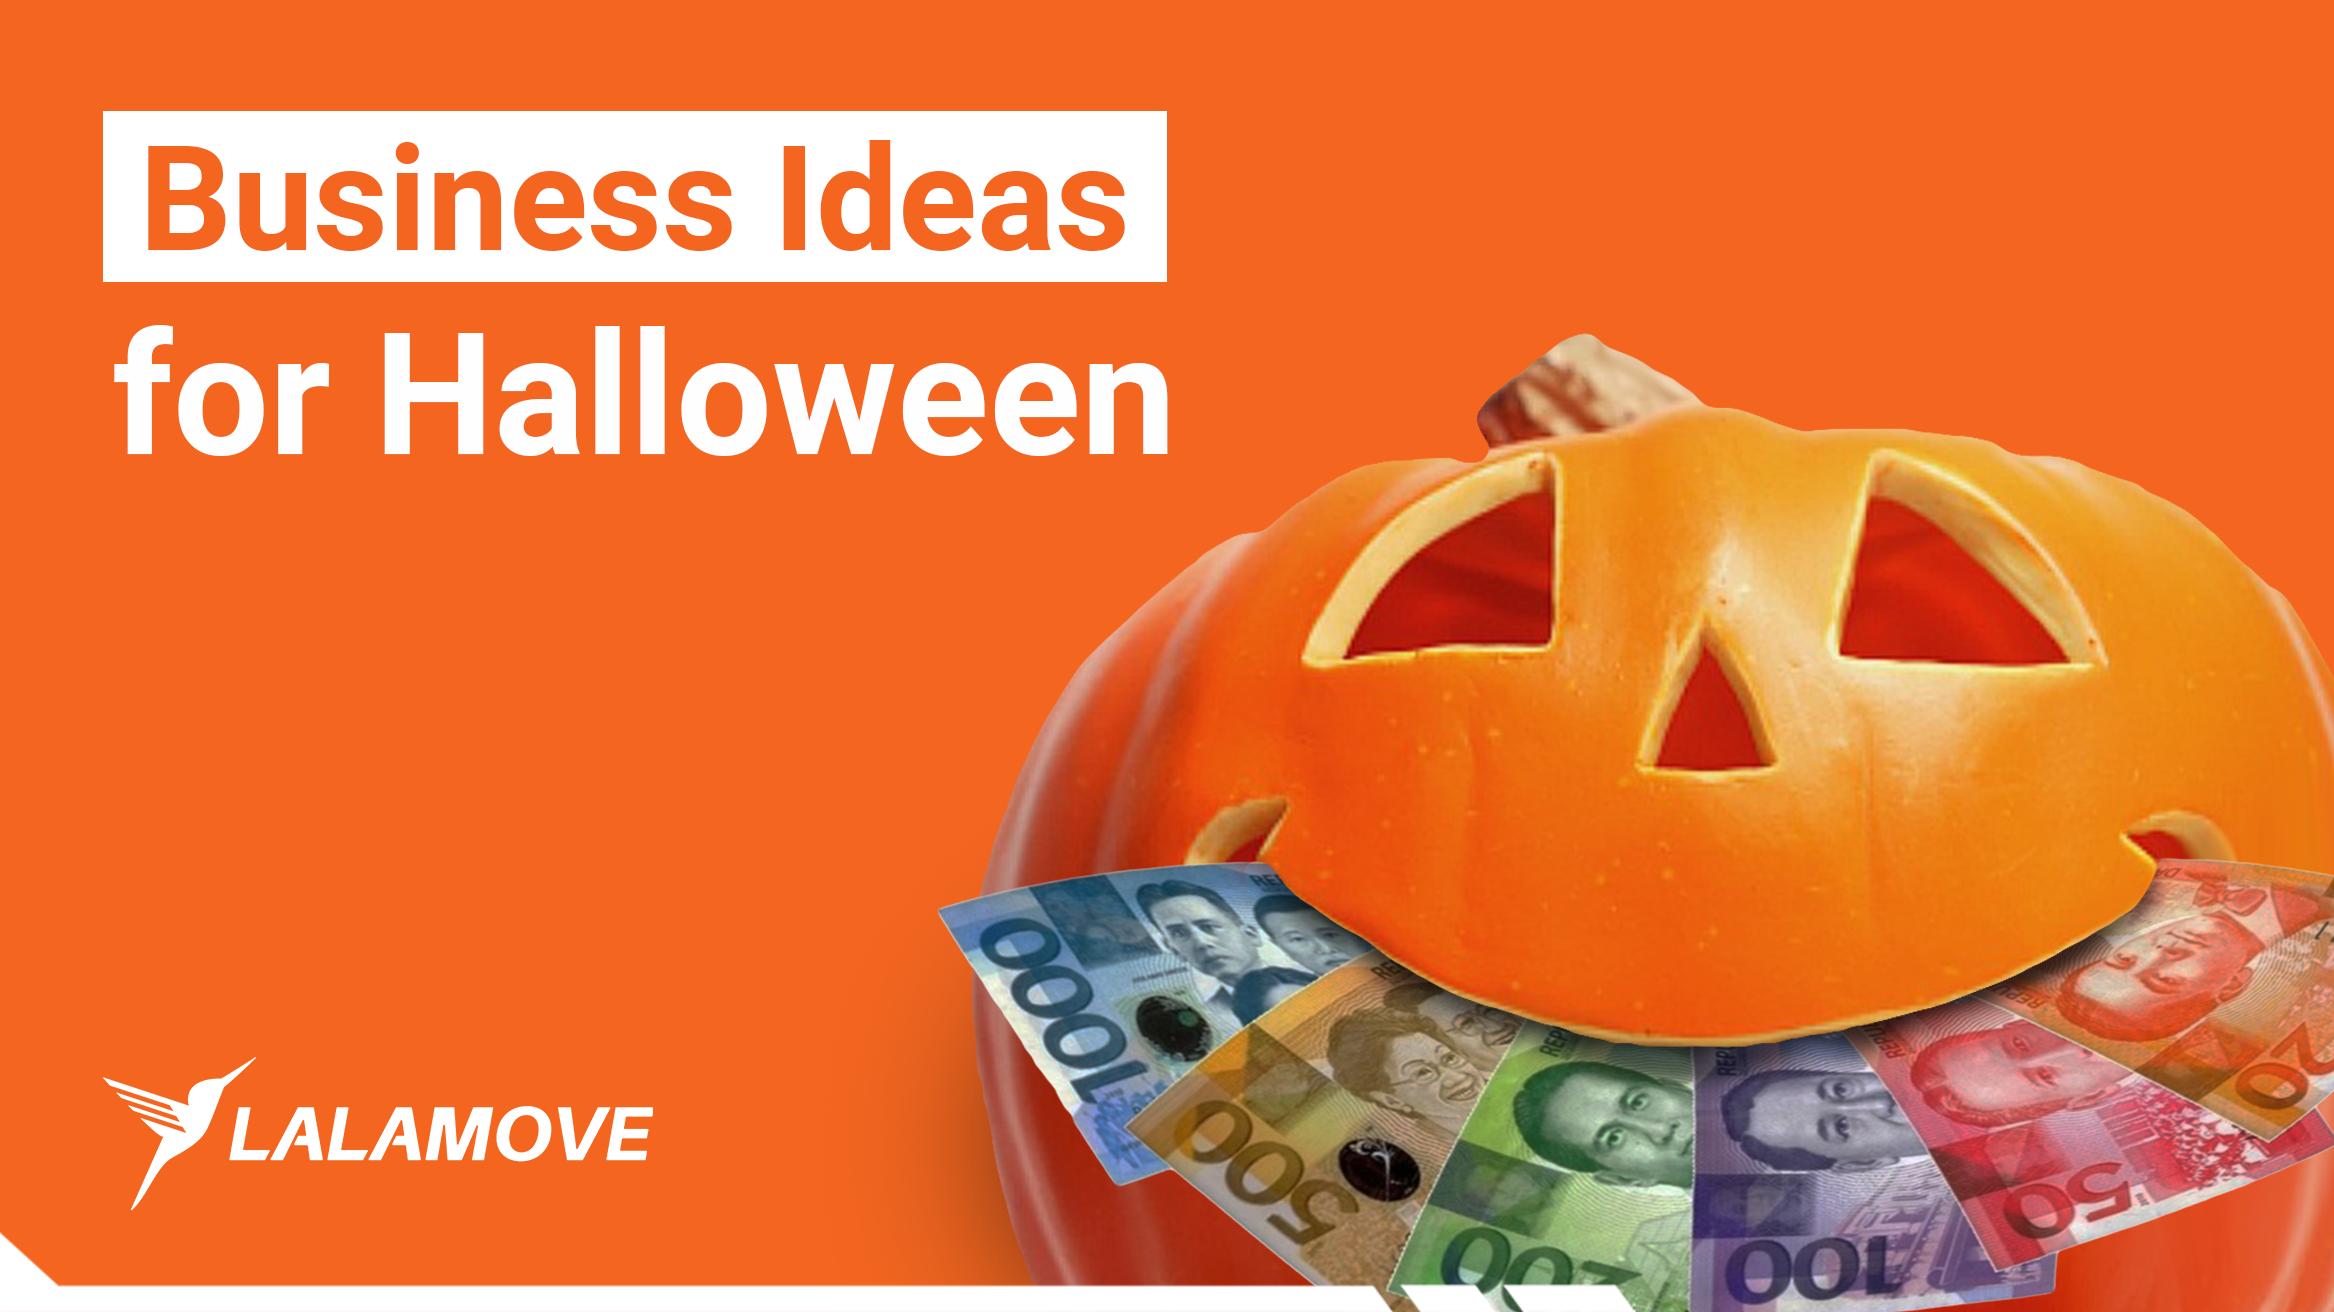 Blog_Banner_HalloweenBusiIdeas